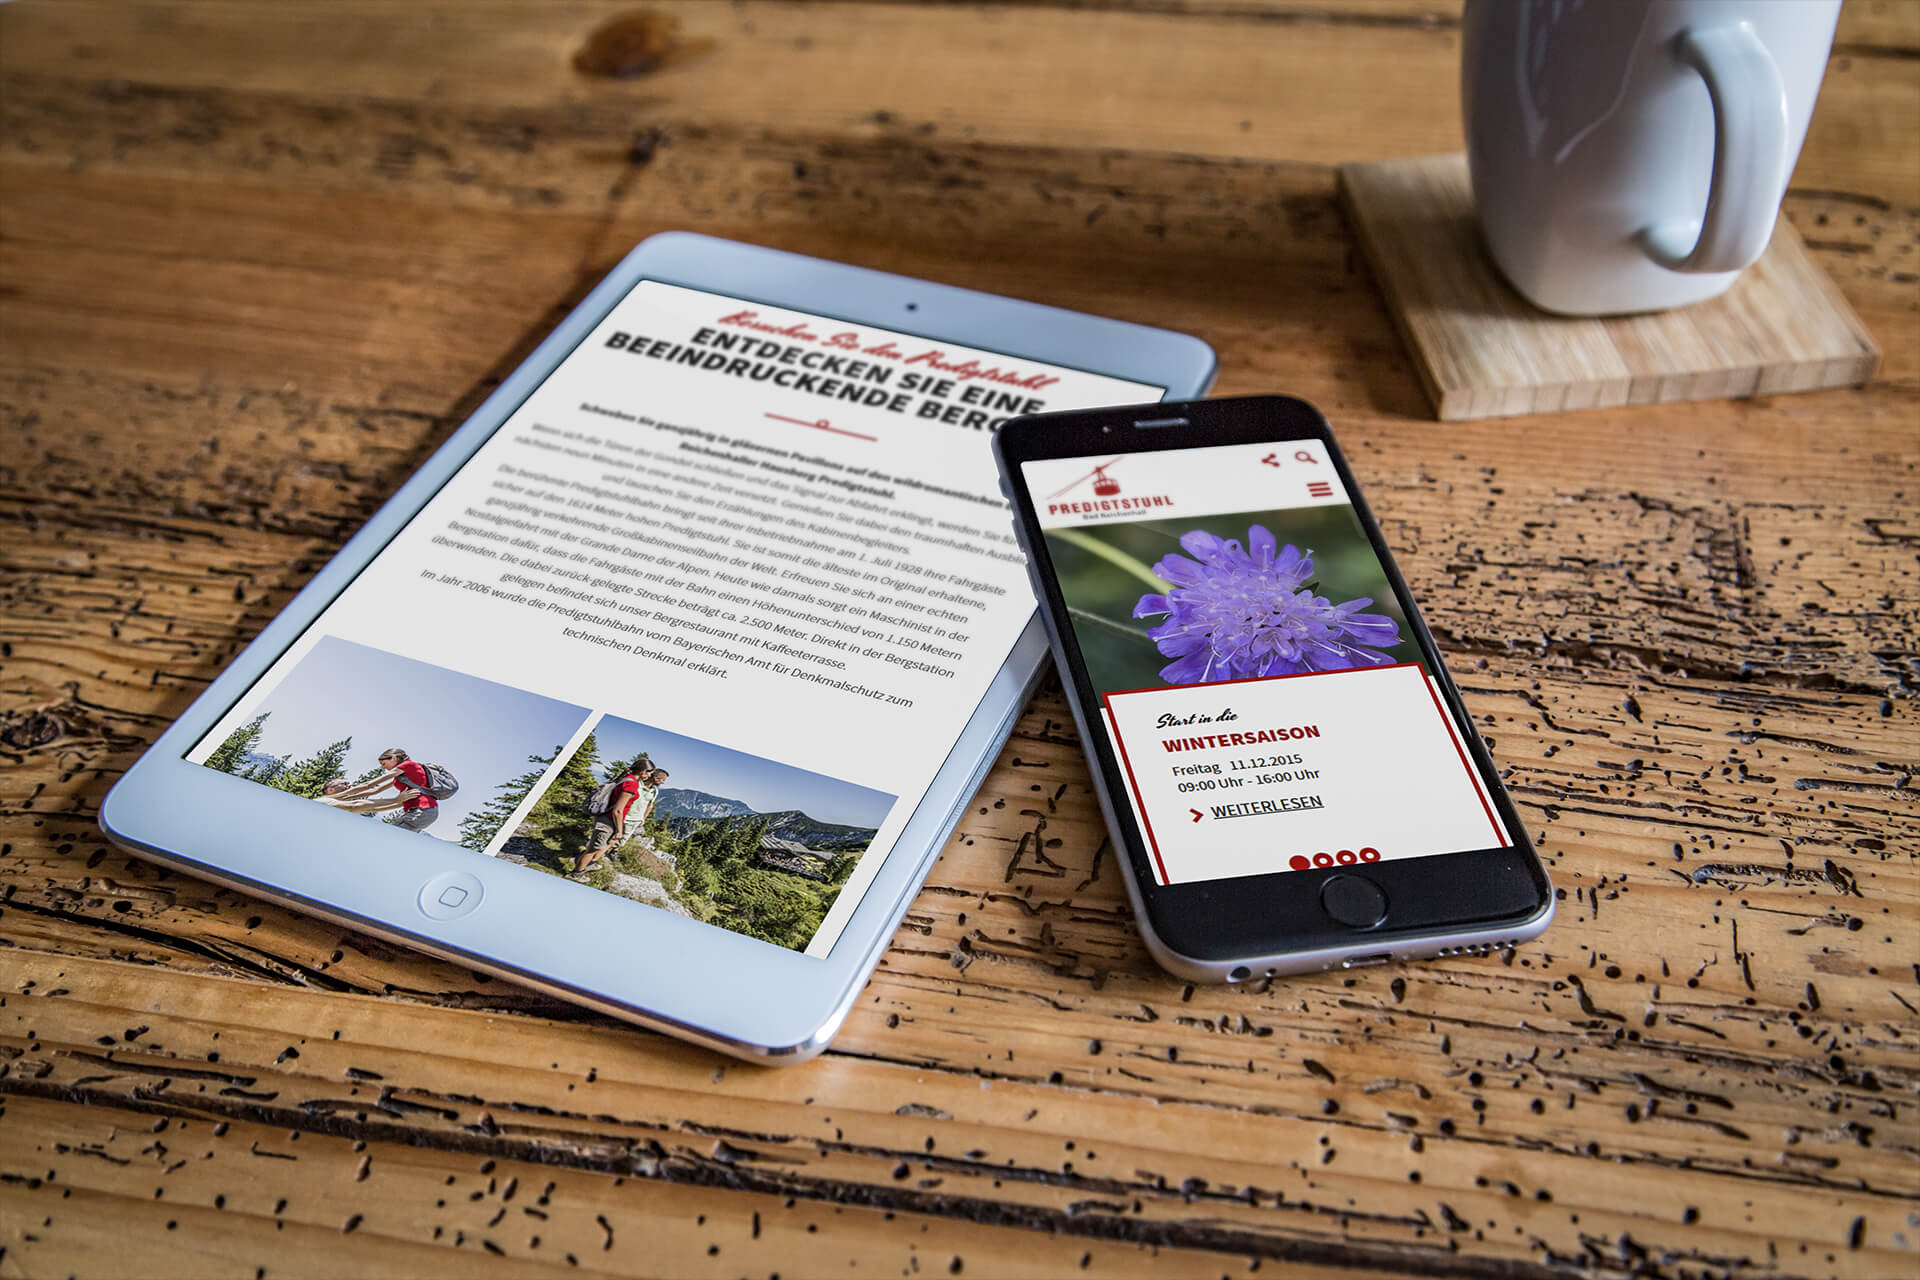 Bi Predigtstuhl Tablet Handy